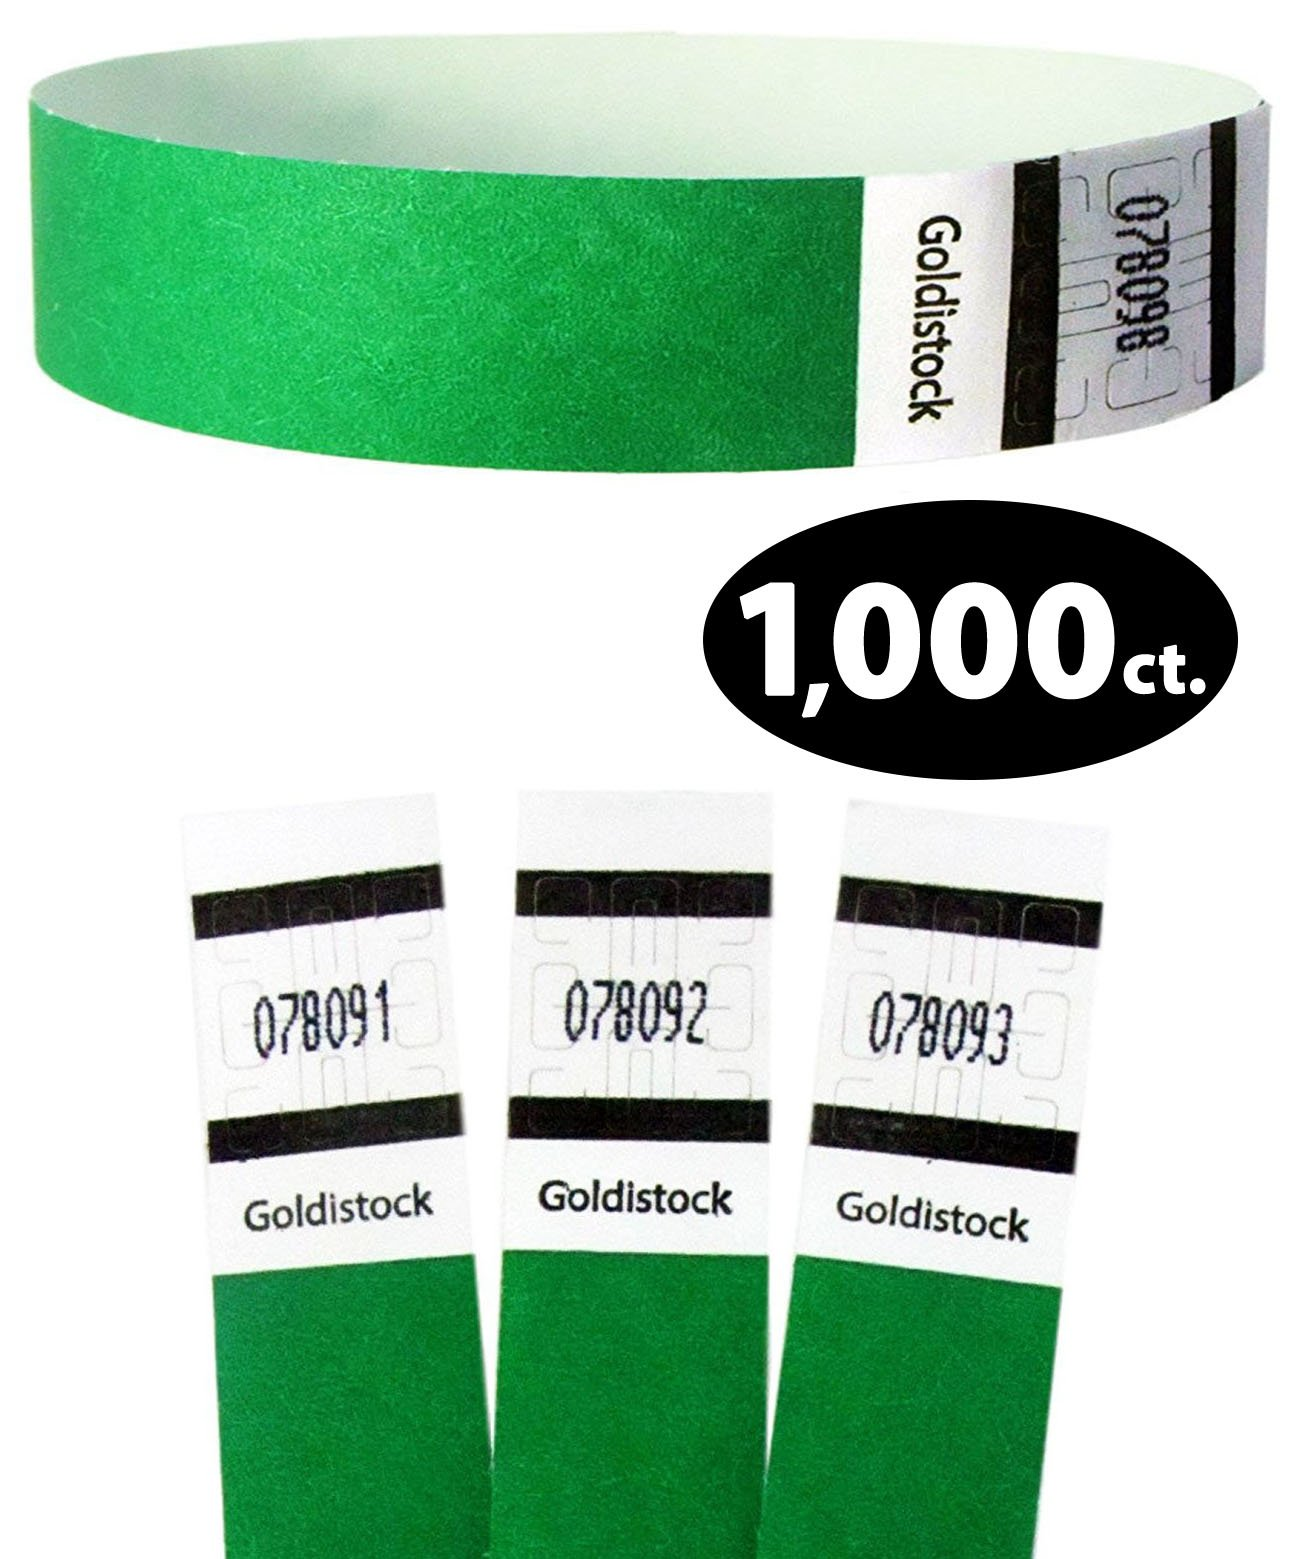 Goldistock Original Series - 3/4'' Tyvek Wristbands Value Pack Evergreen Green 1,000 Count - Event Identification Bands (Paper - Like Texture)